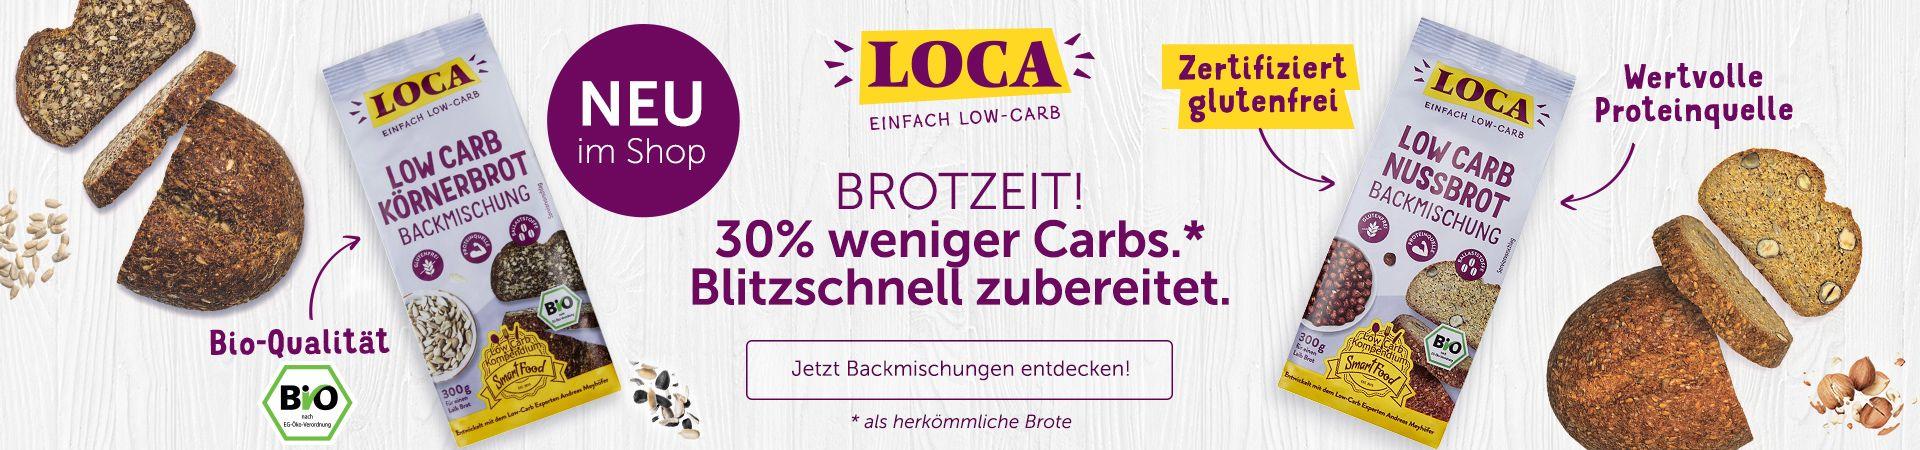 LOCA Brotbackmischungen, Nussbrot, Körnerbrot, 30% weniger Carbs, Low Carb.